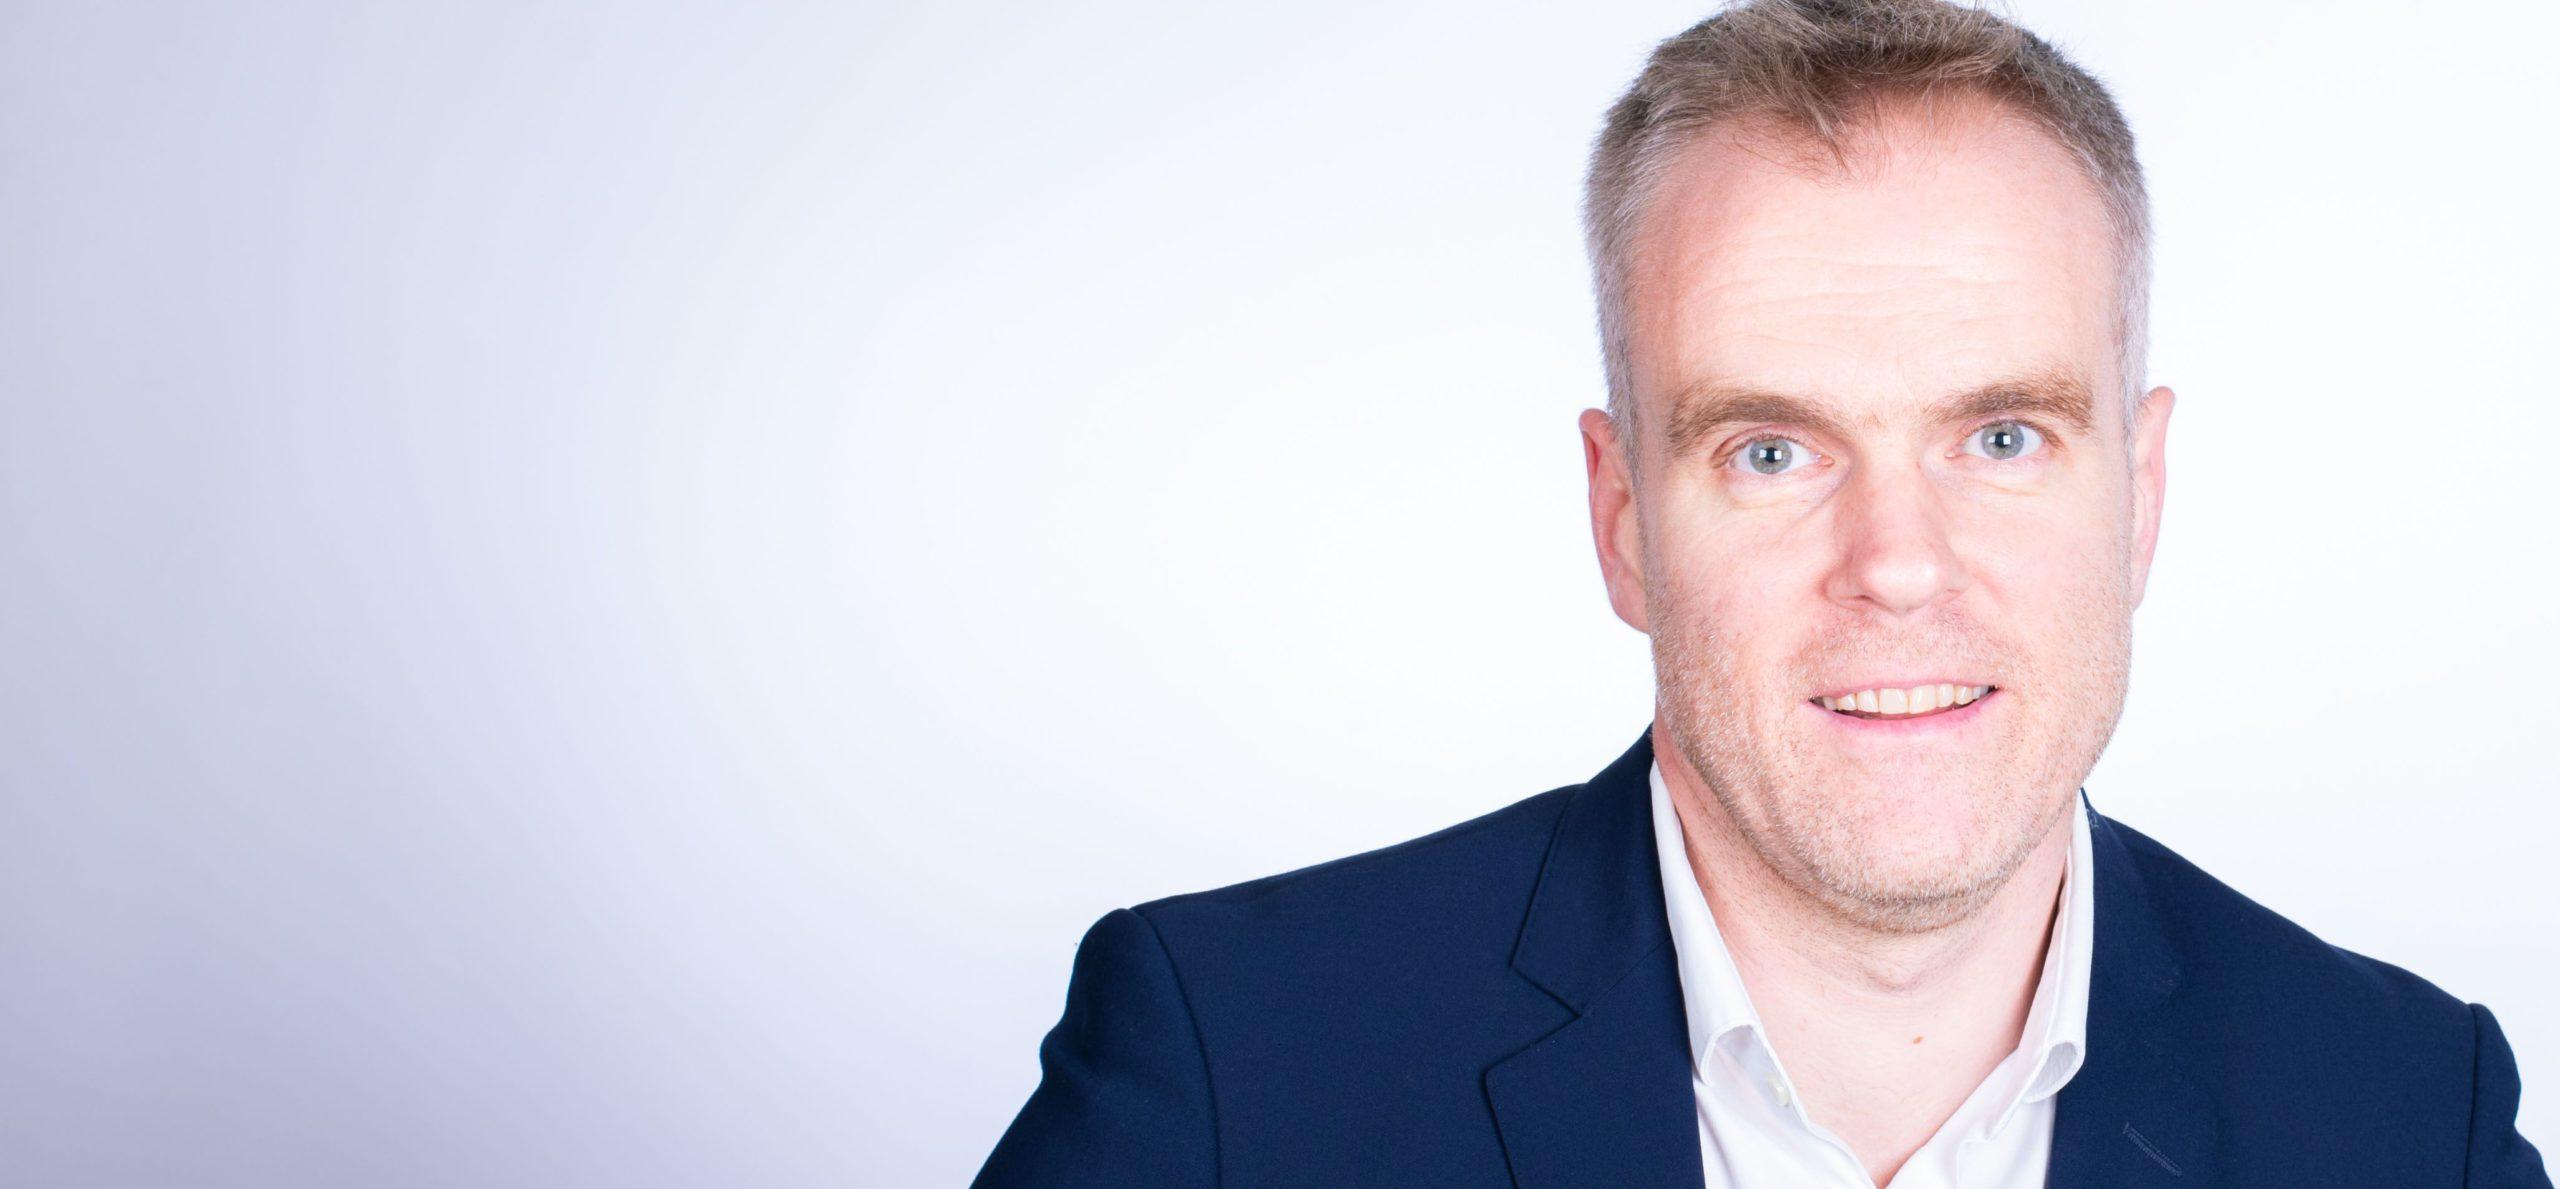 Career Coach, Killian O'Leary, joins Virtual Recruitment Ireland